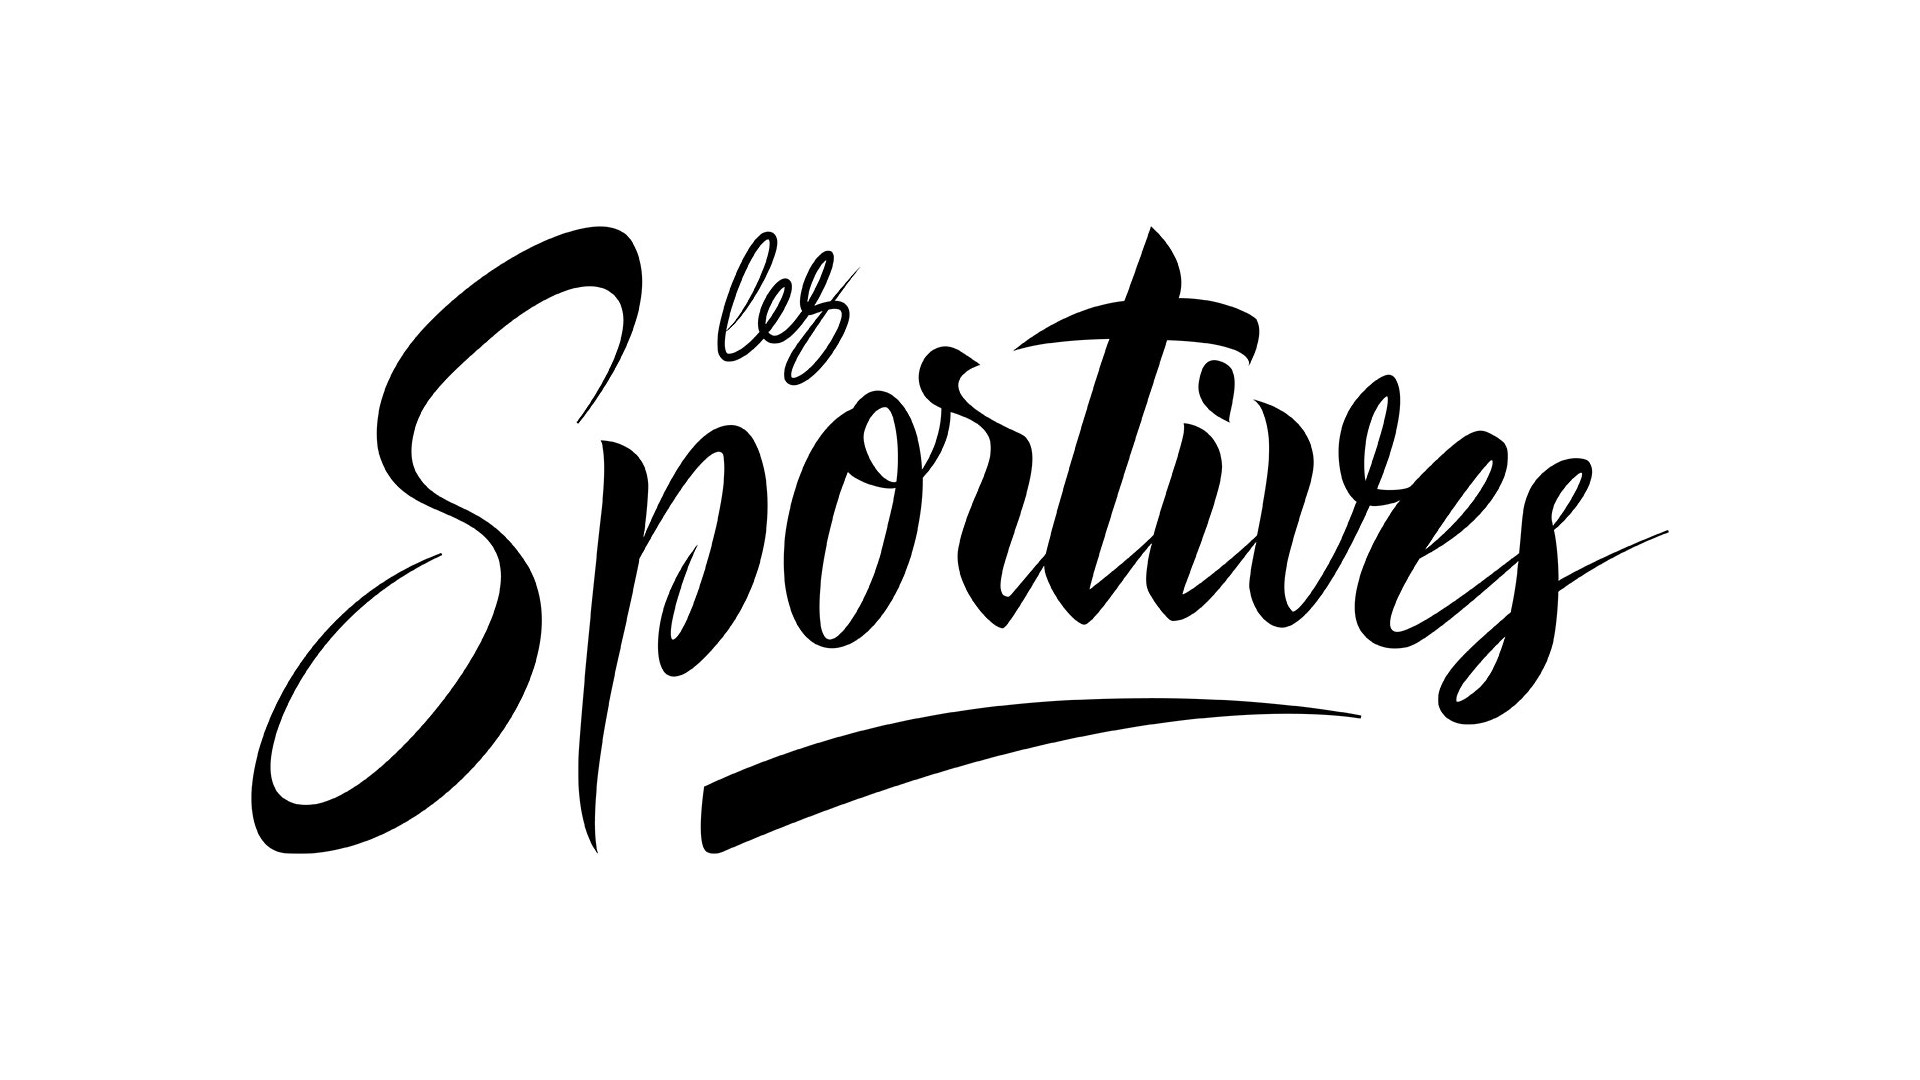 Les Sportives (1) logo